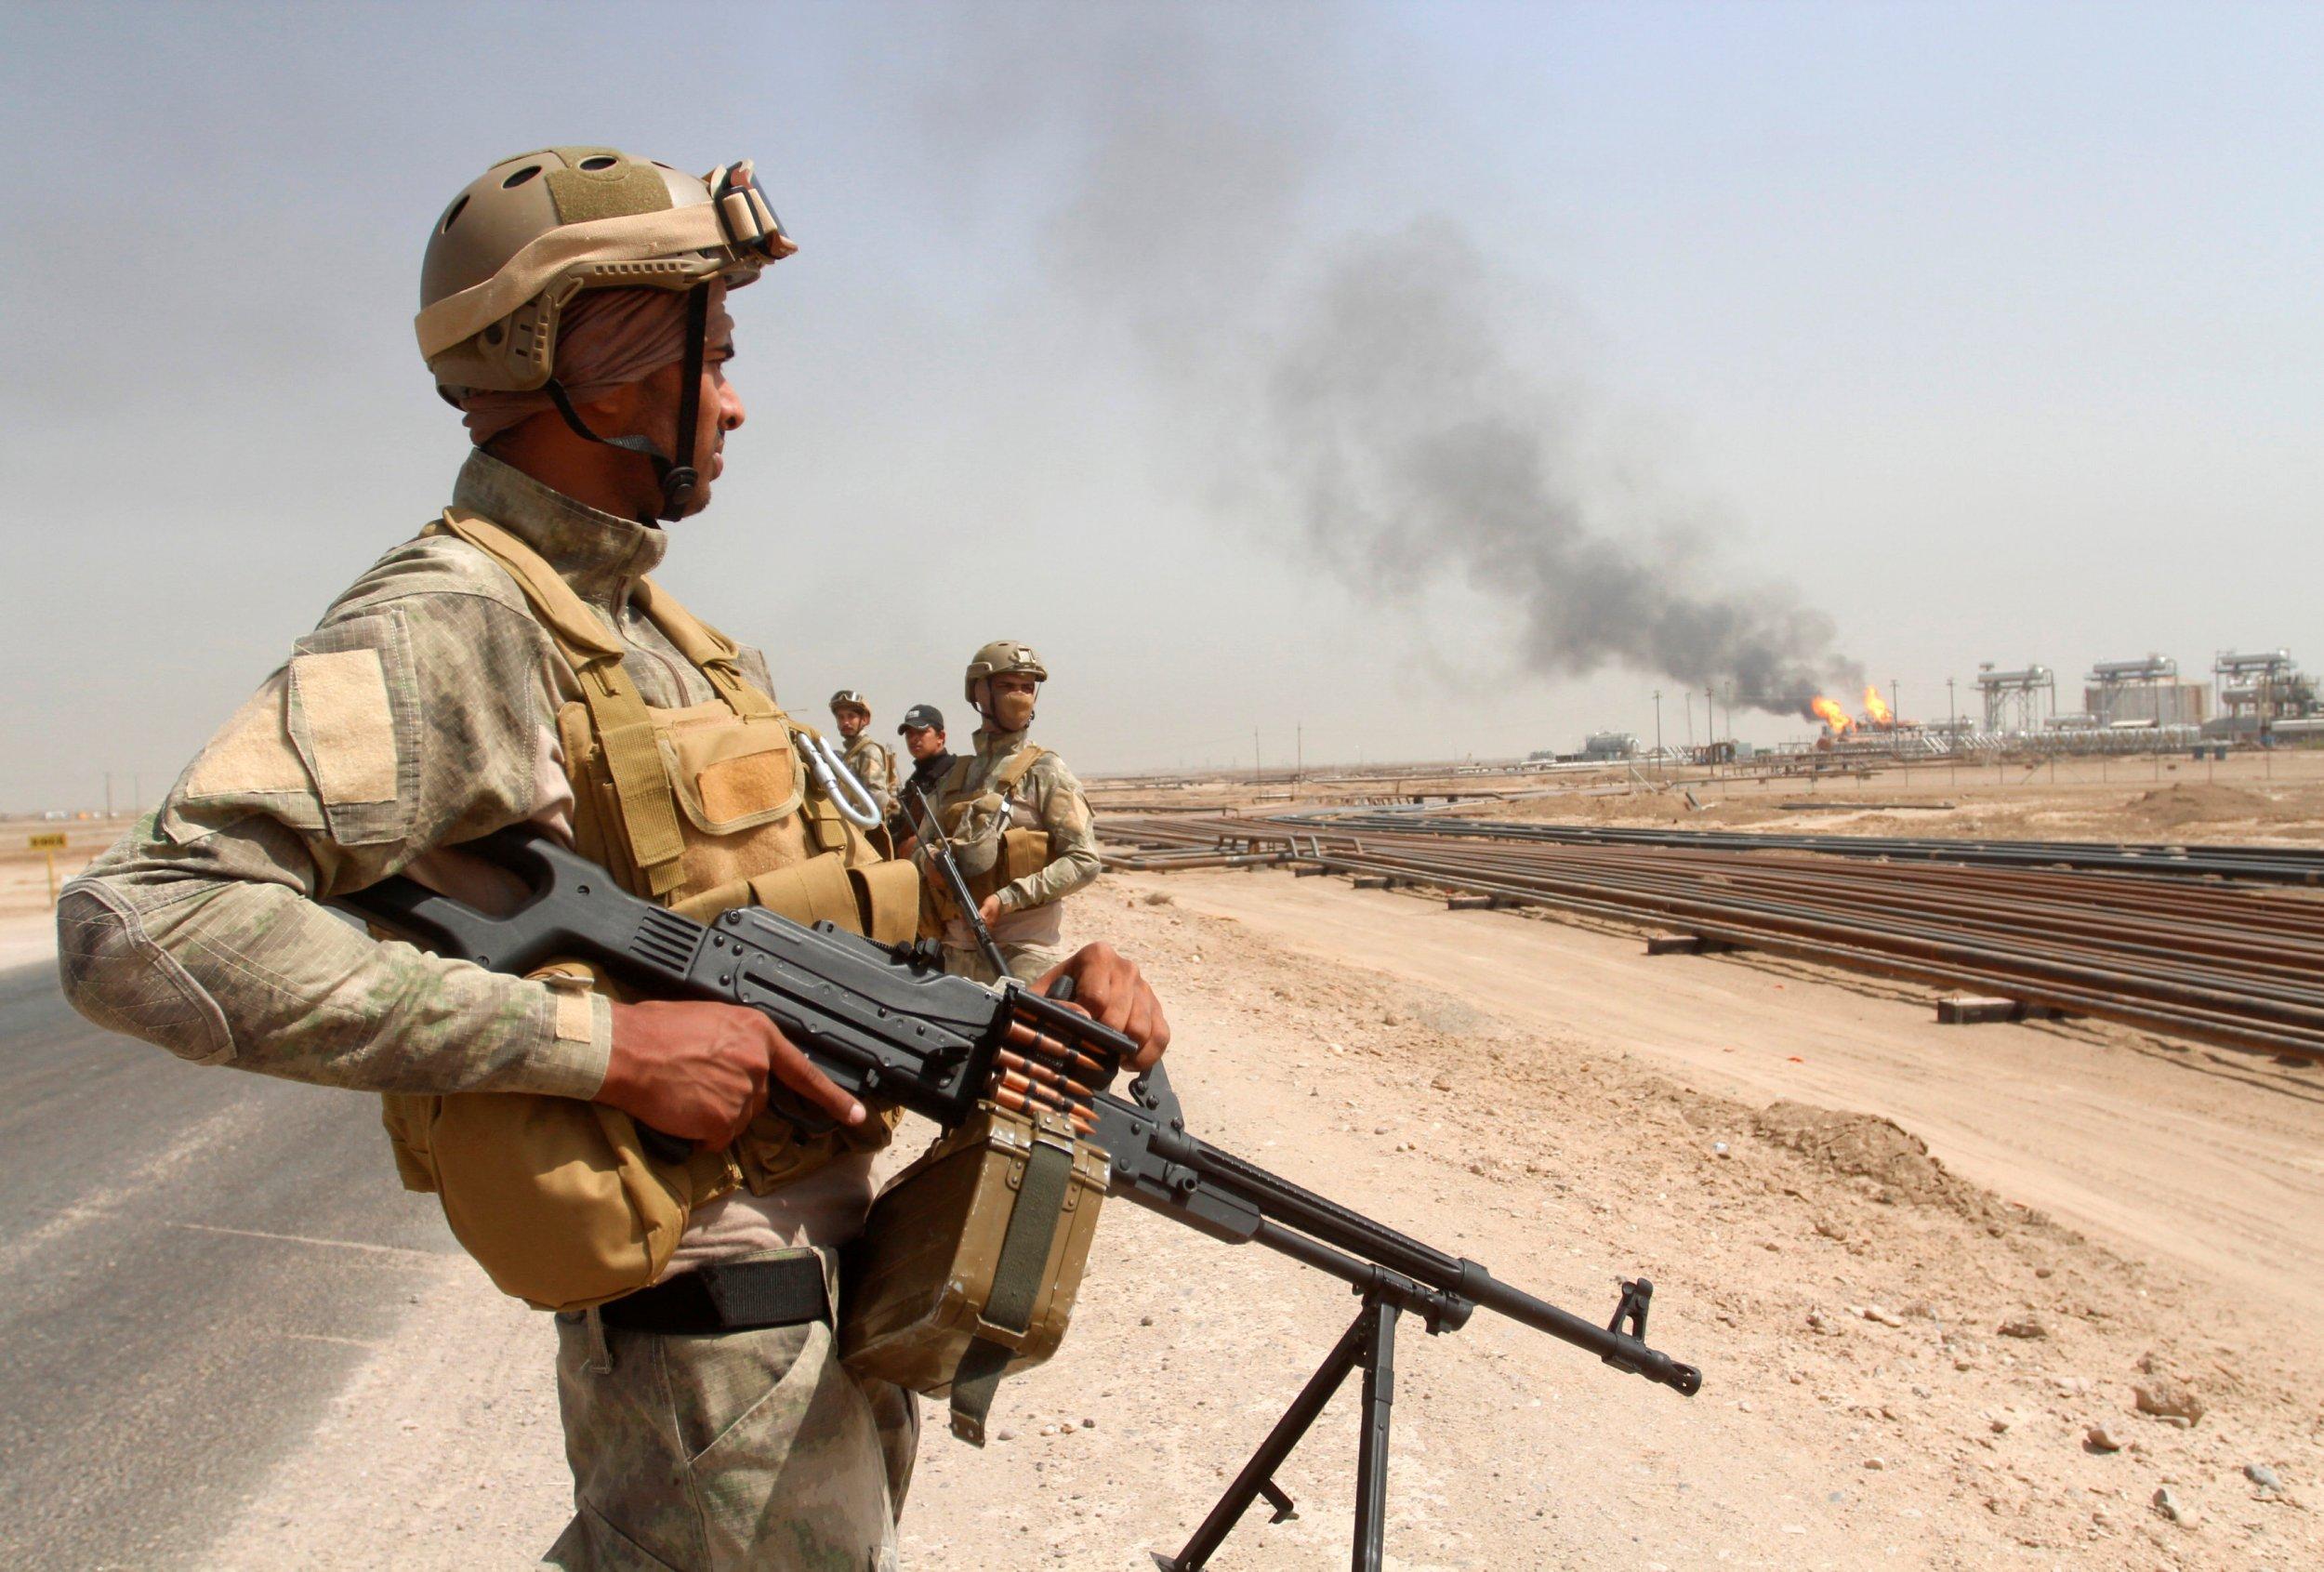 07_30_Coup_Iraq_01